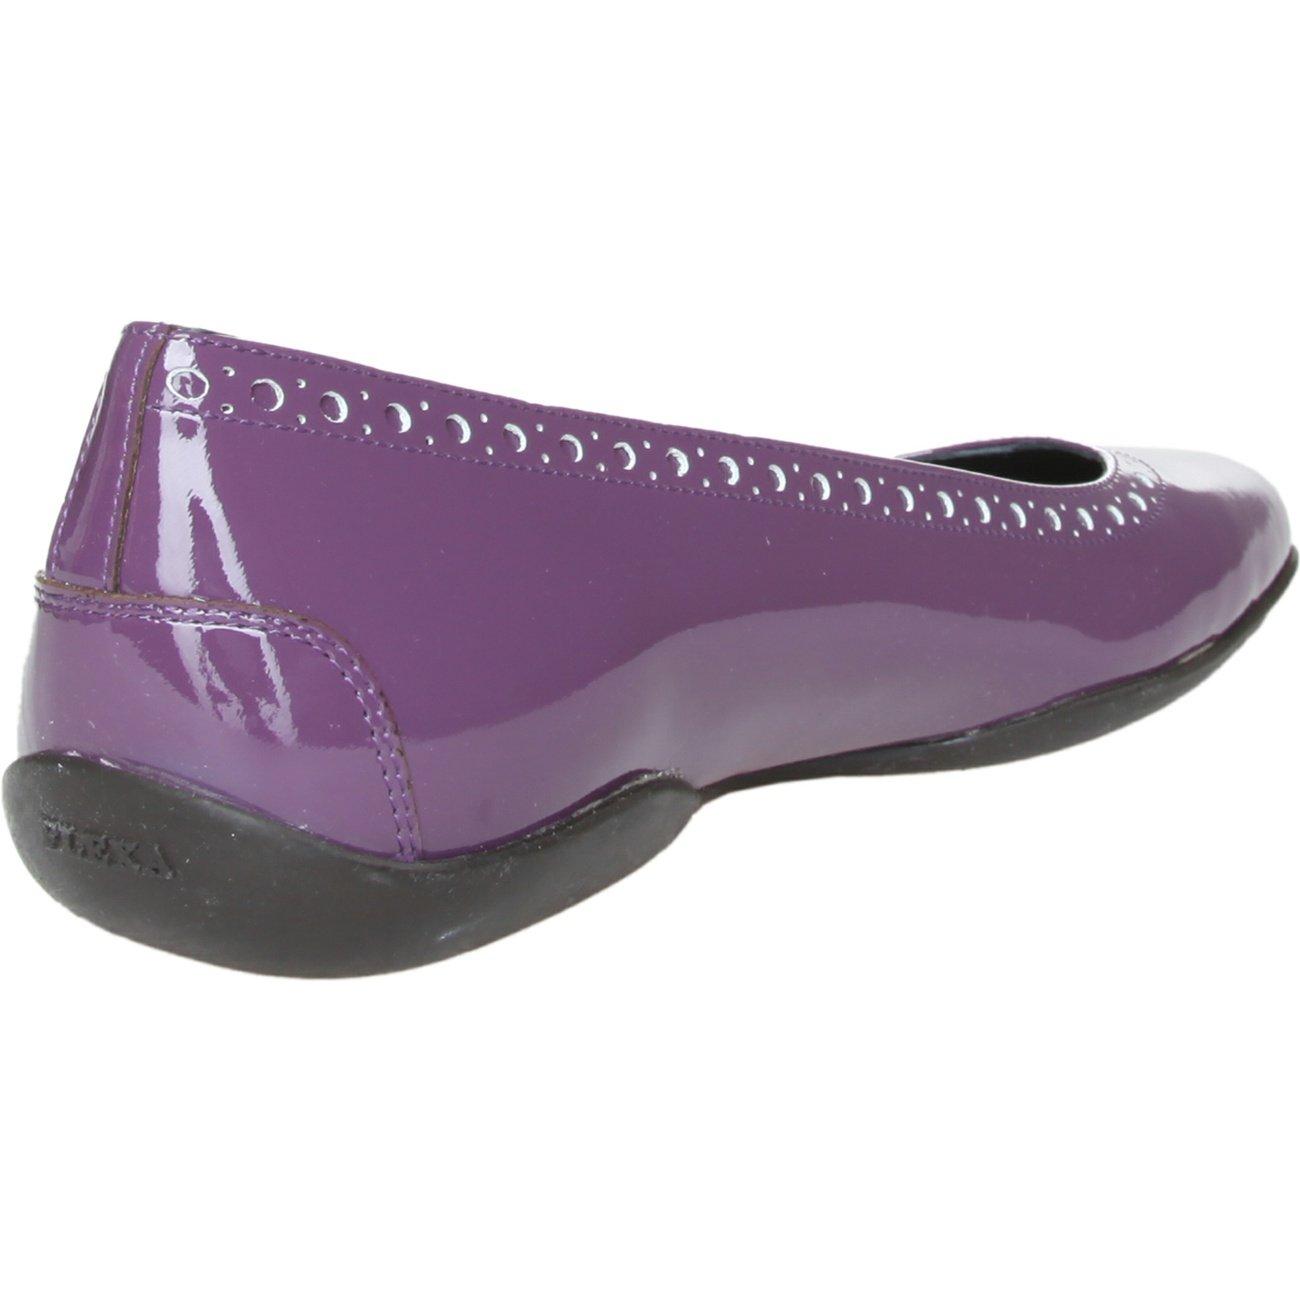 Fratelli Rossetti 'PAINT' 76399_8443 Damenschuhe Slipper Moccasins Ballerinas EU 4.5 37 37.5 UK 4, 4.5 EU Lila Purple Leder Leder 596d03